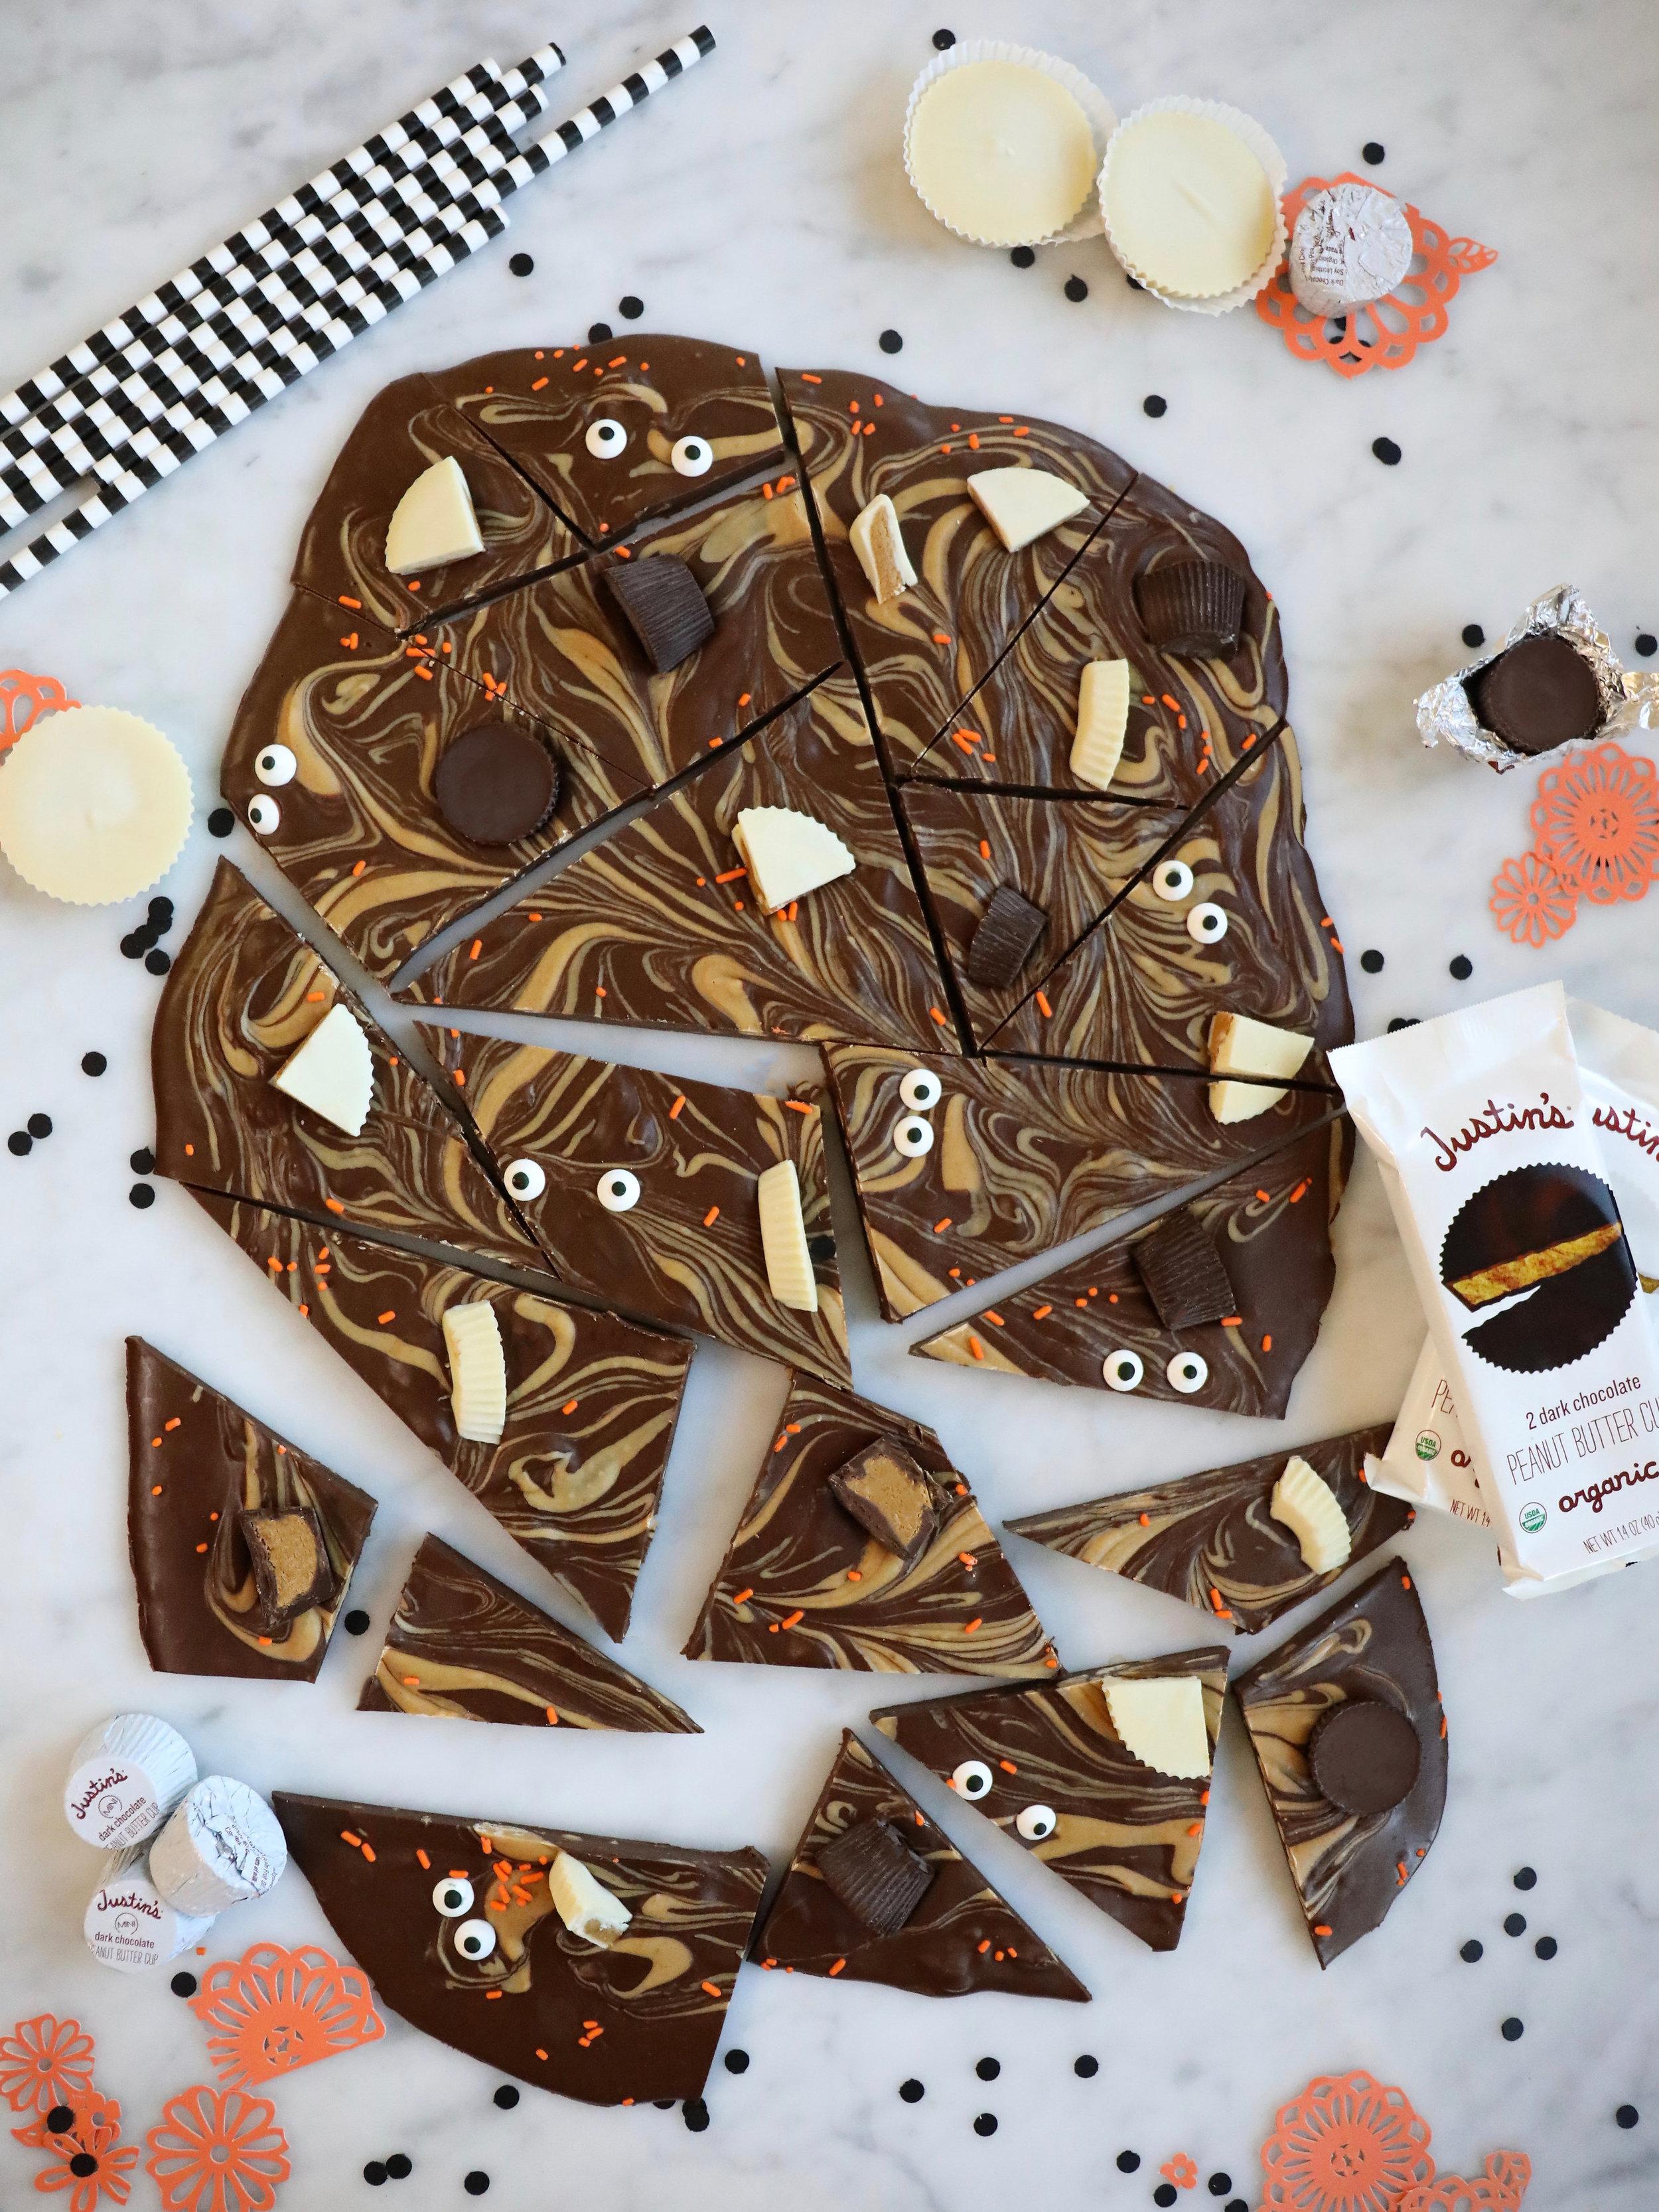 Peanut Butter Chocolate Bark.jpg